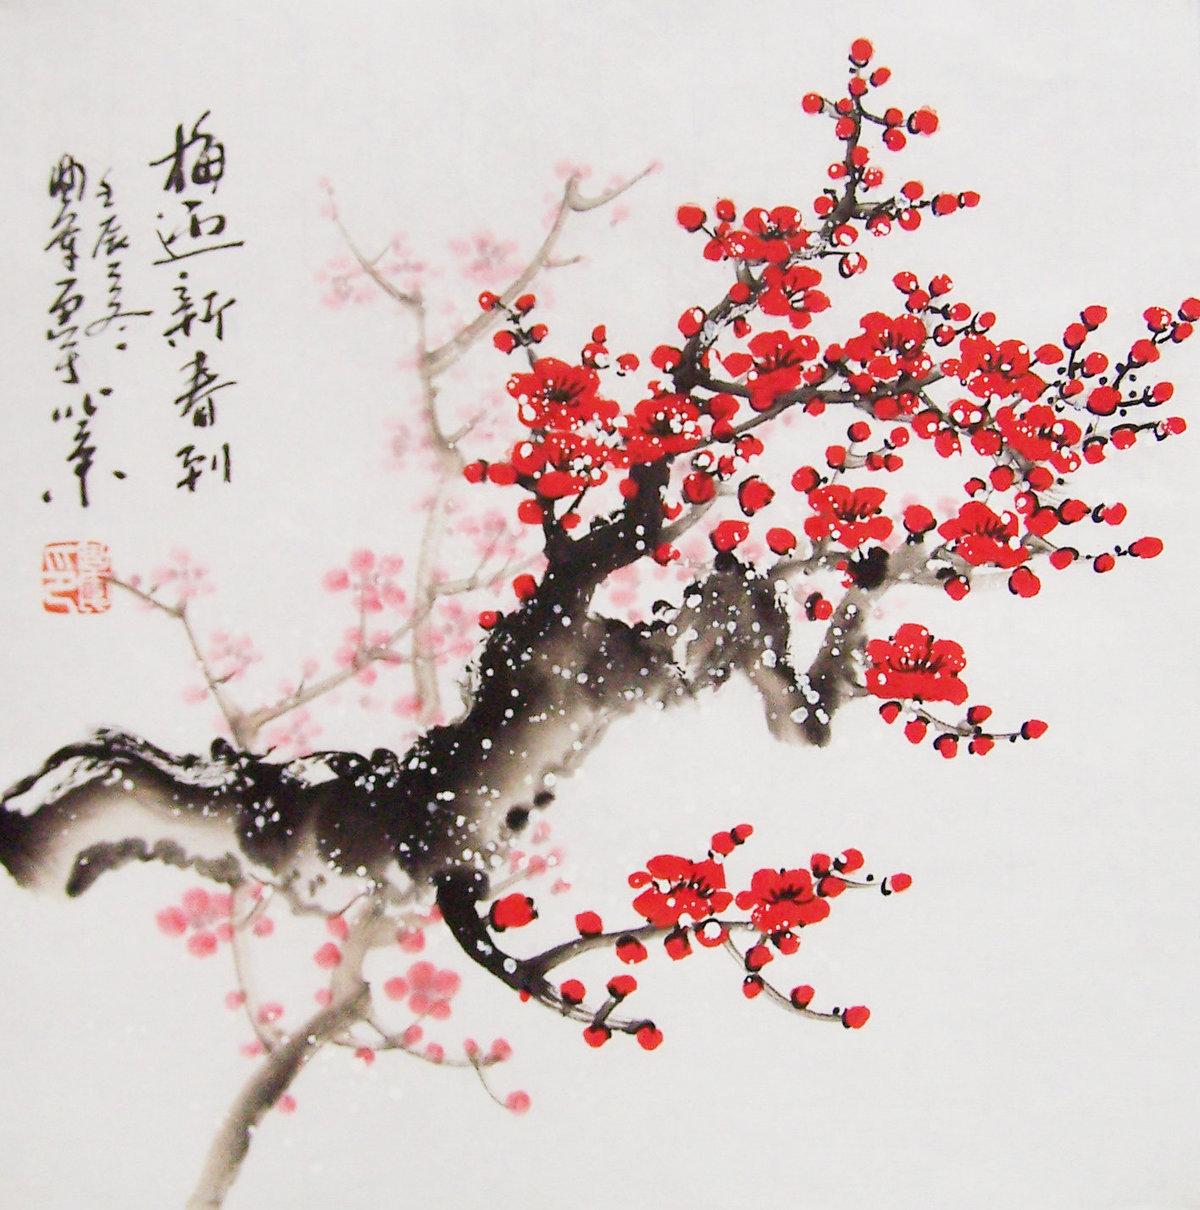 рисунок в японском стиле сакура